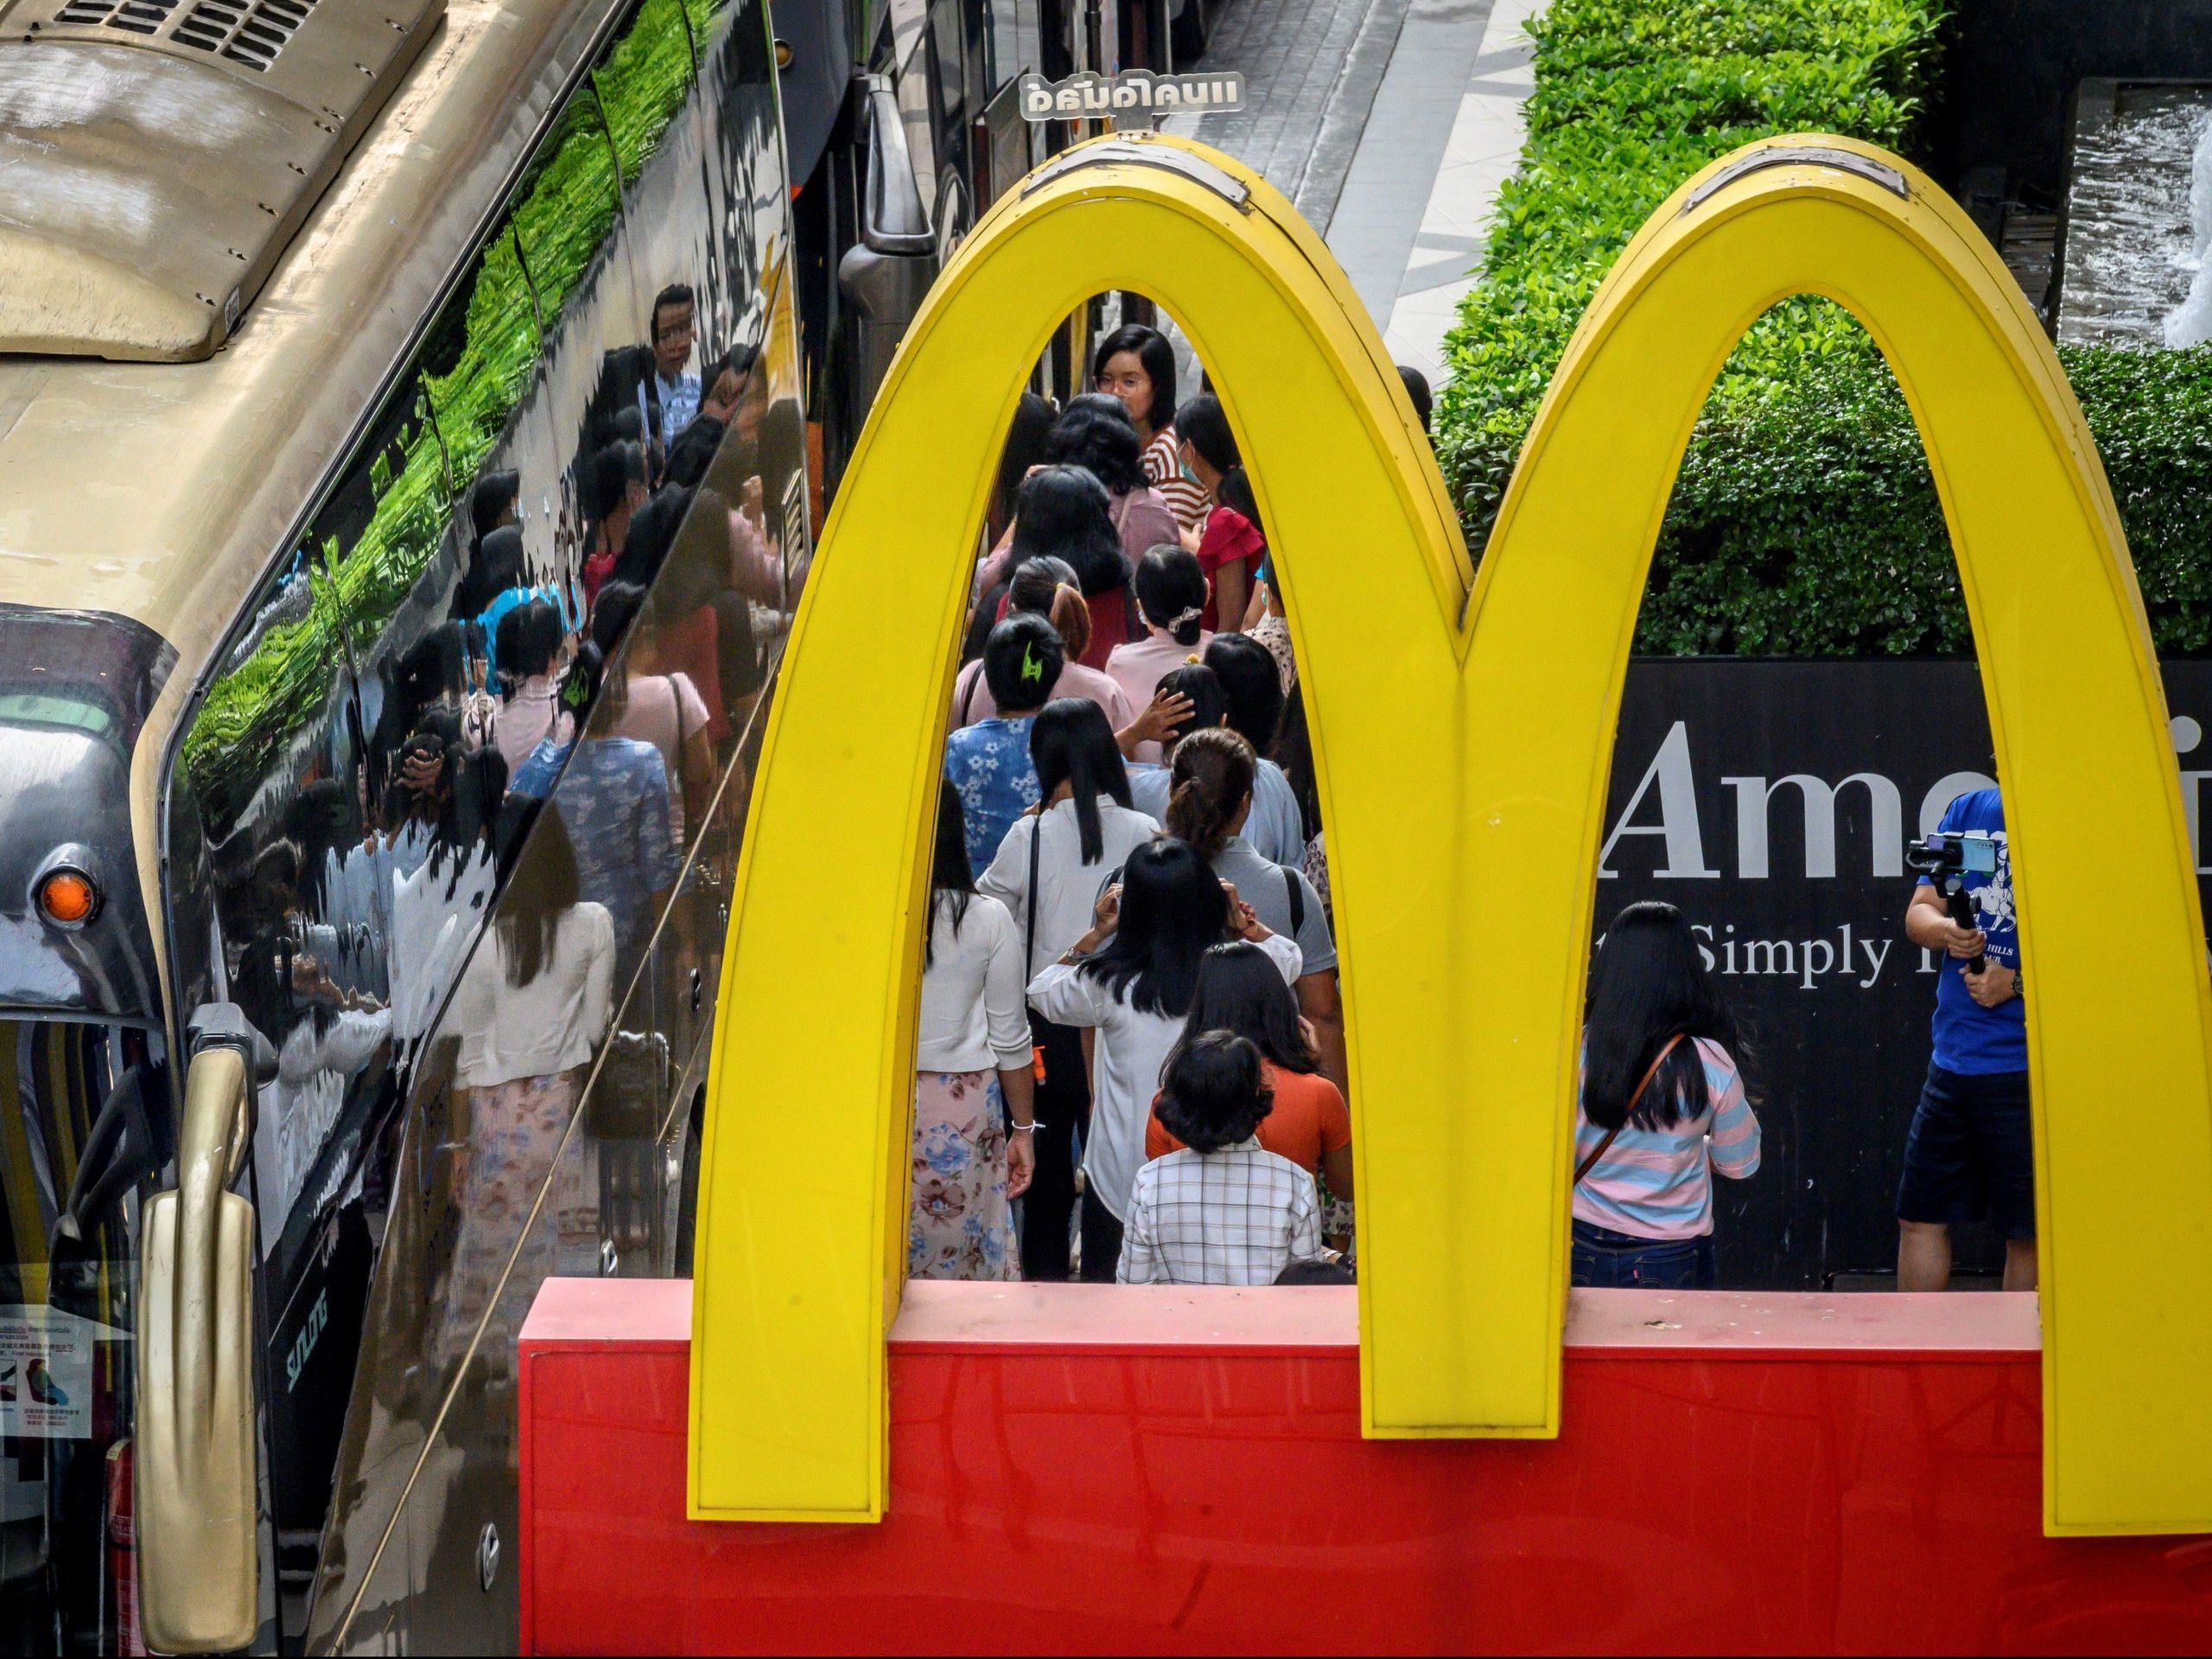 Mcdonald's, Starbucks Halt Dine-in Service In U.s. To Enforce Social Distancing photo